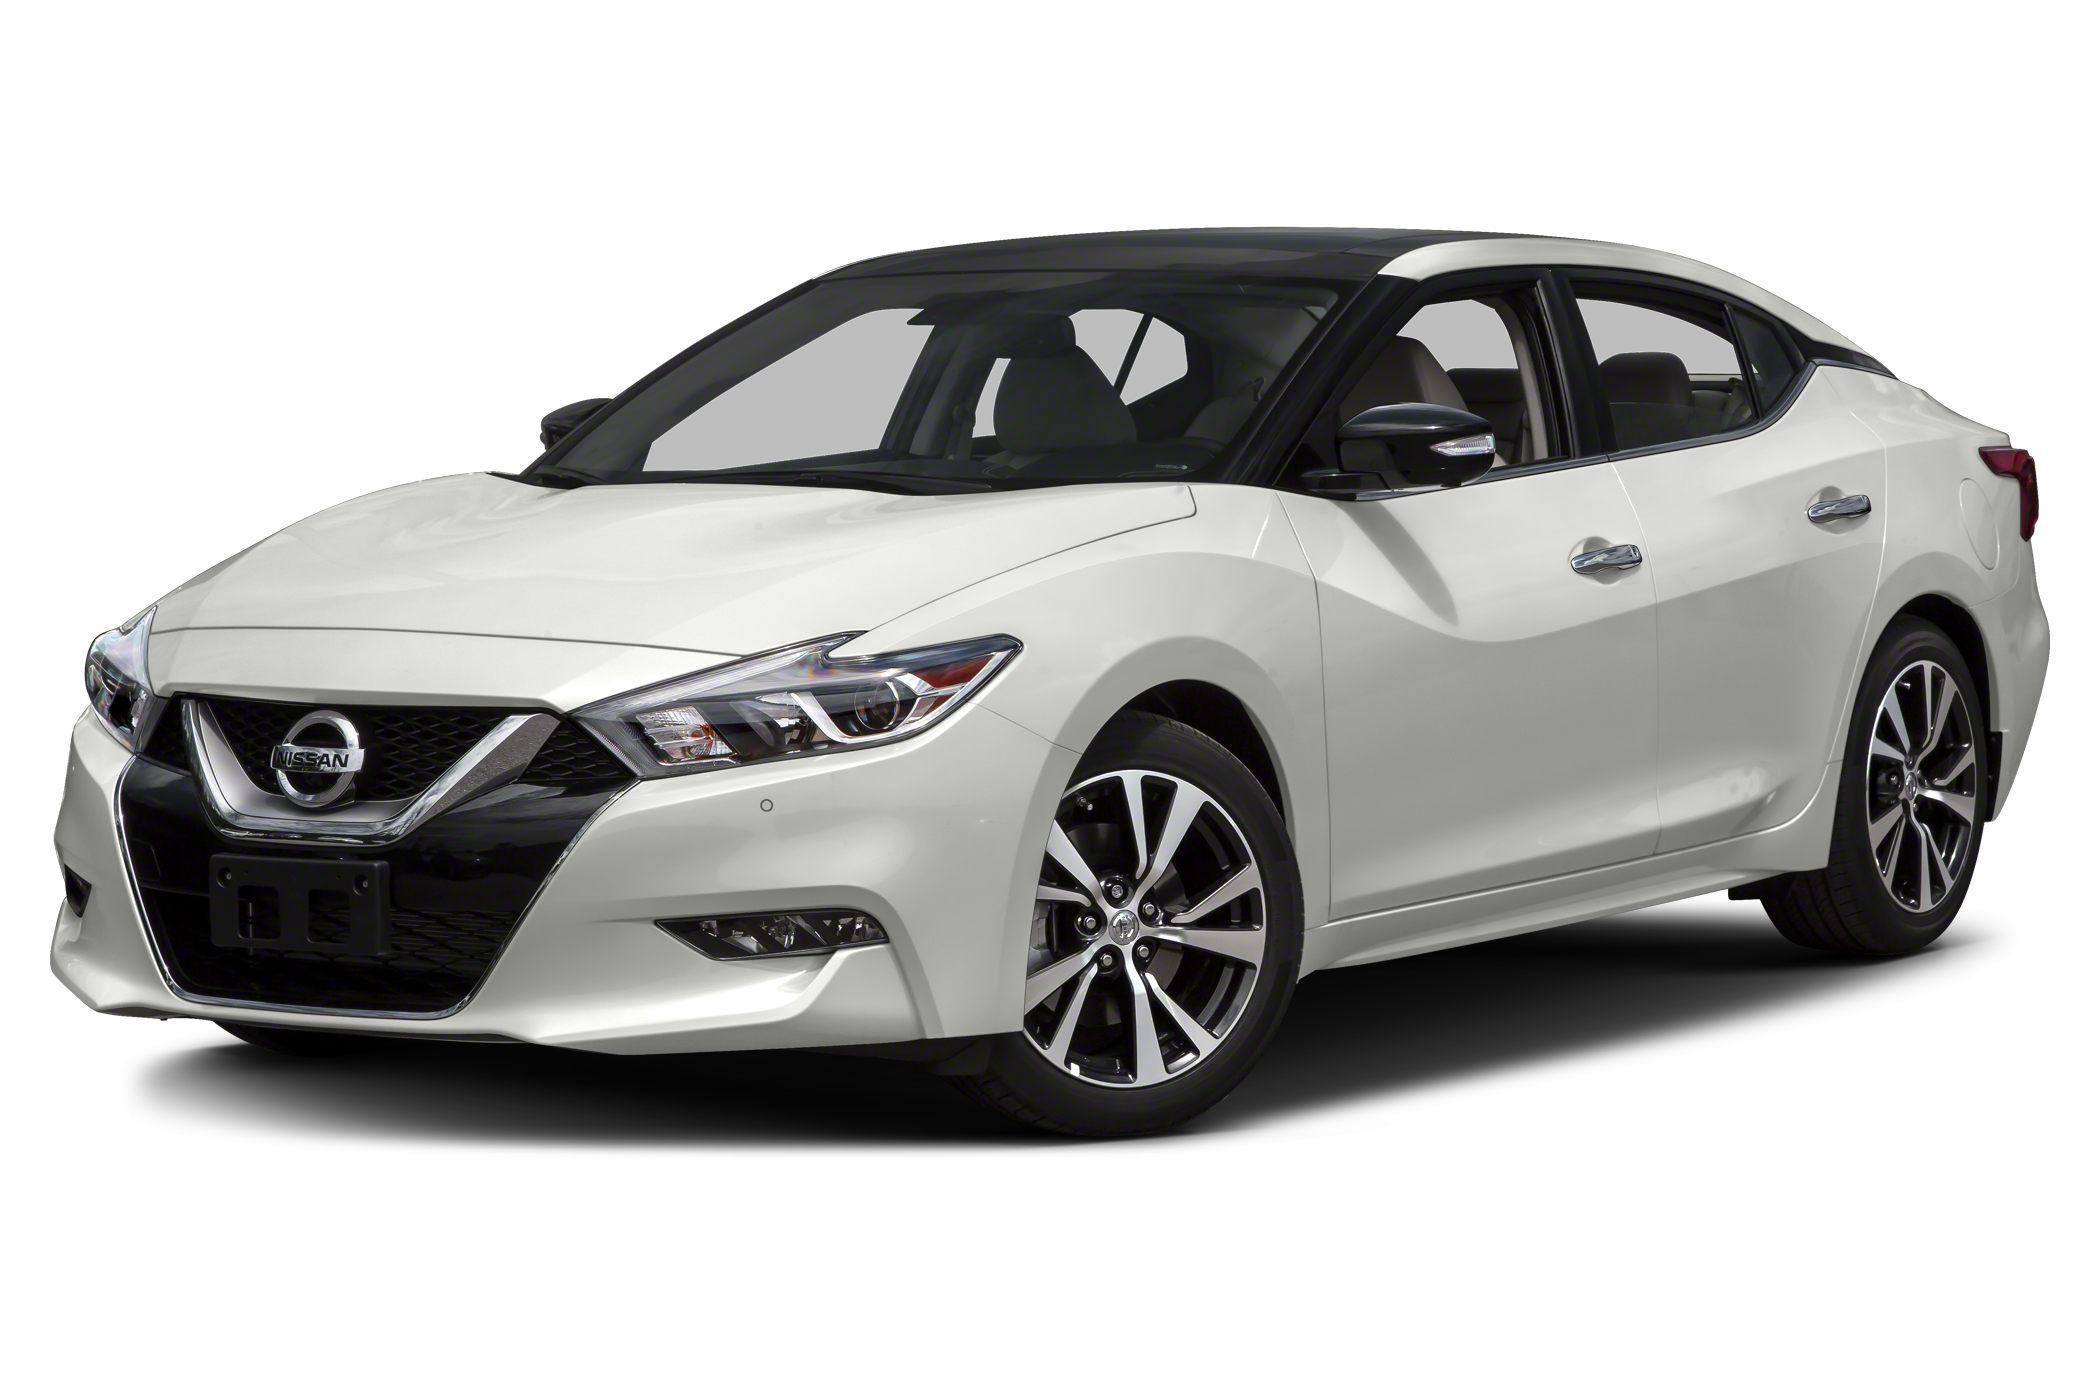 2017 Nissan Maxima Photos